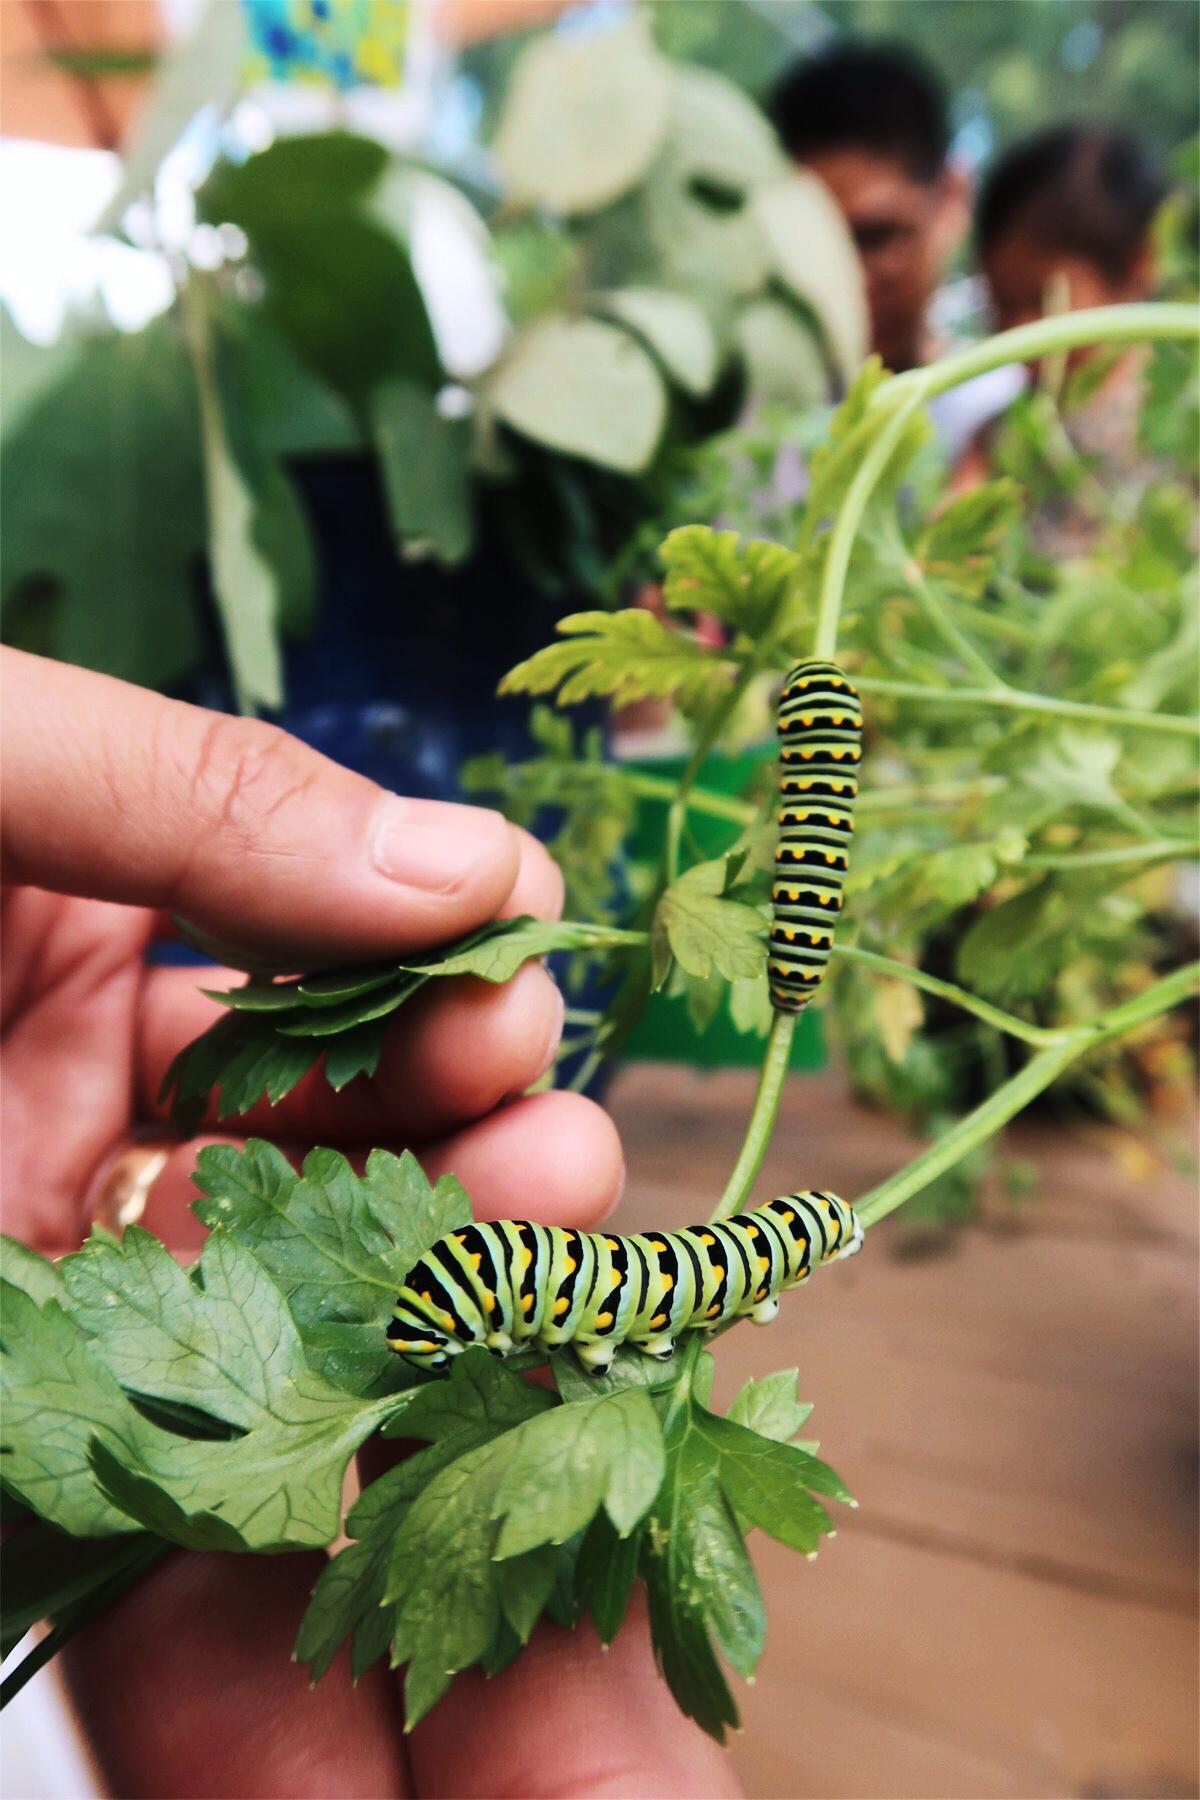 毛毛蟲   Caterpillars